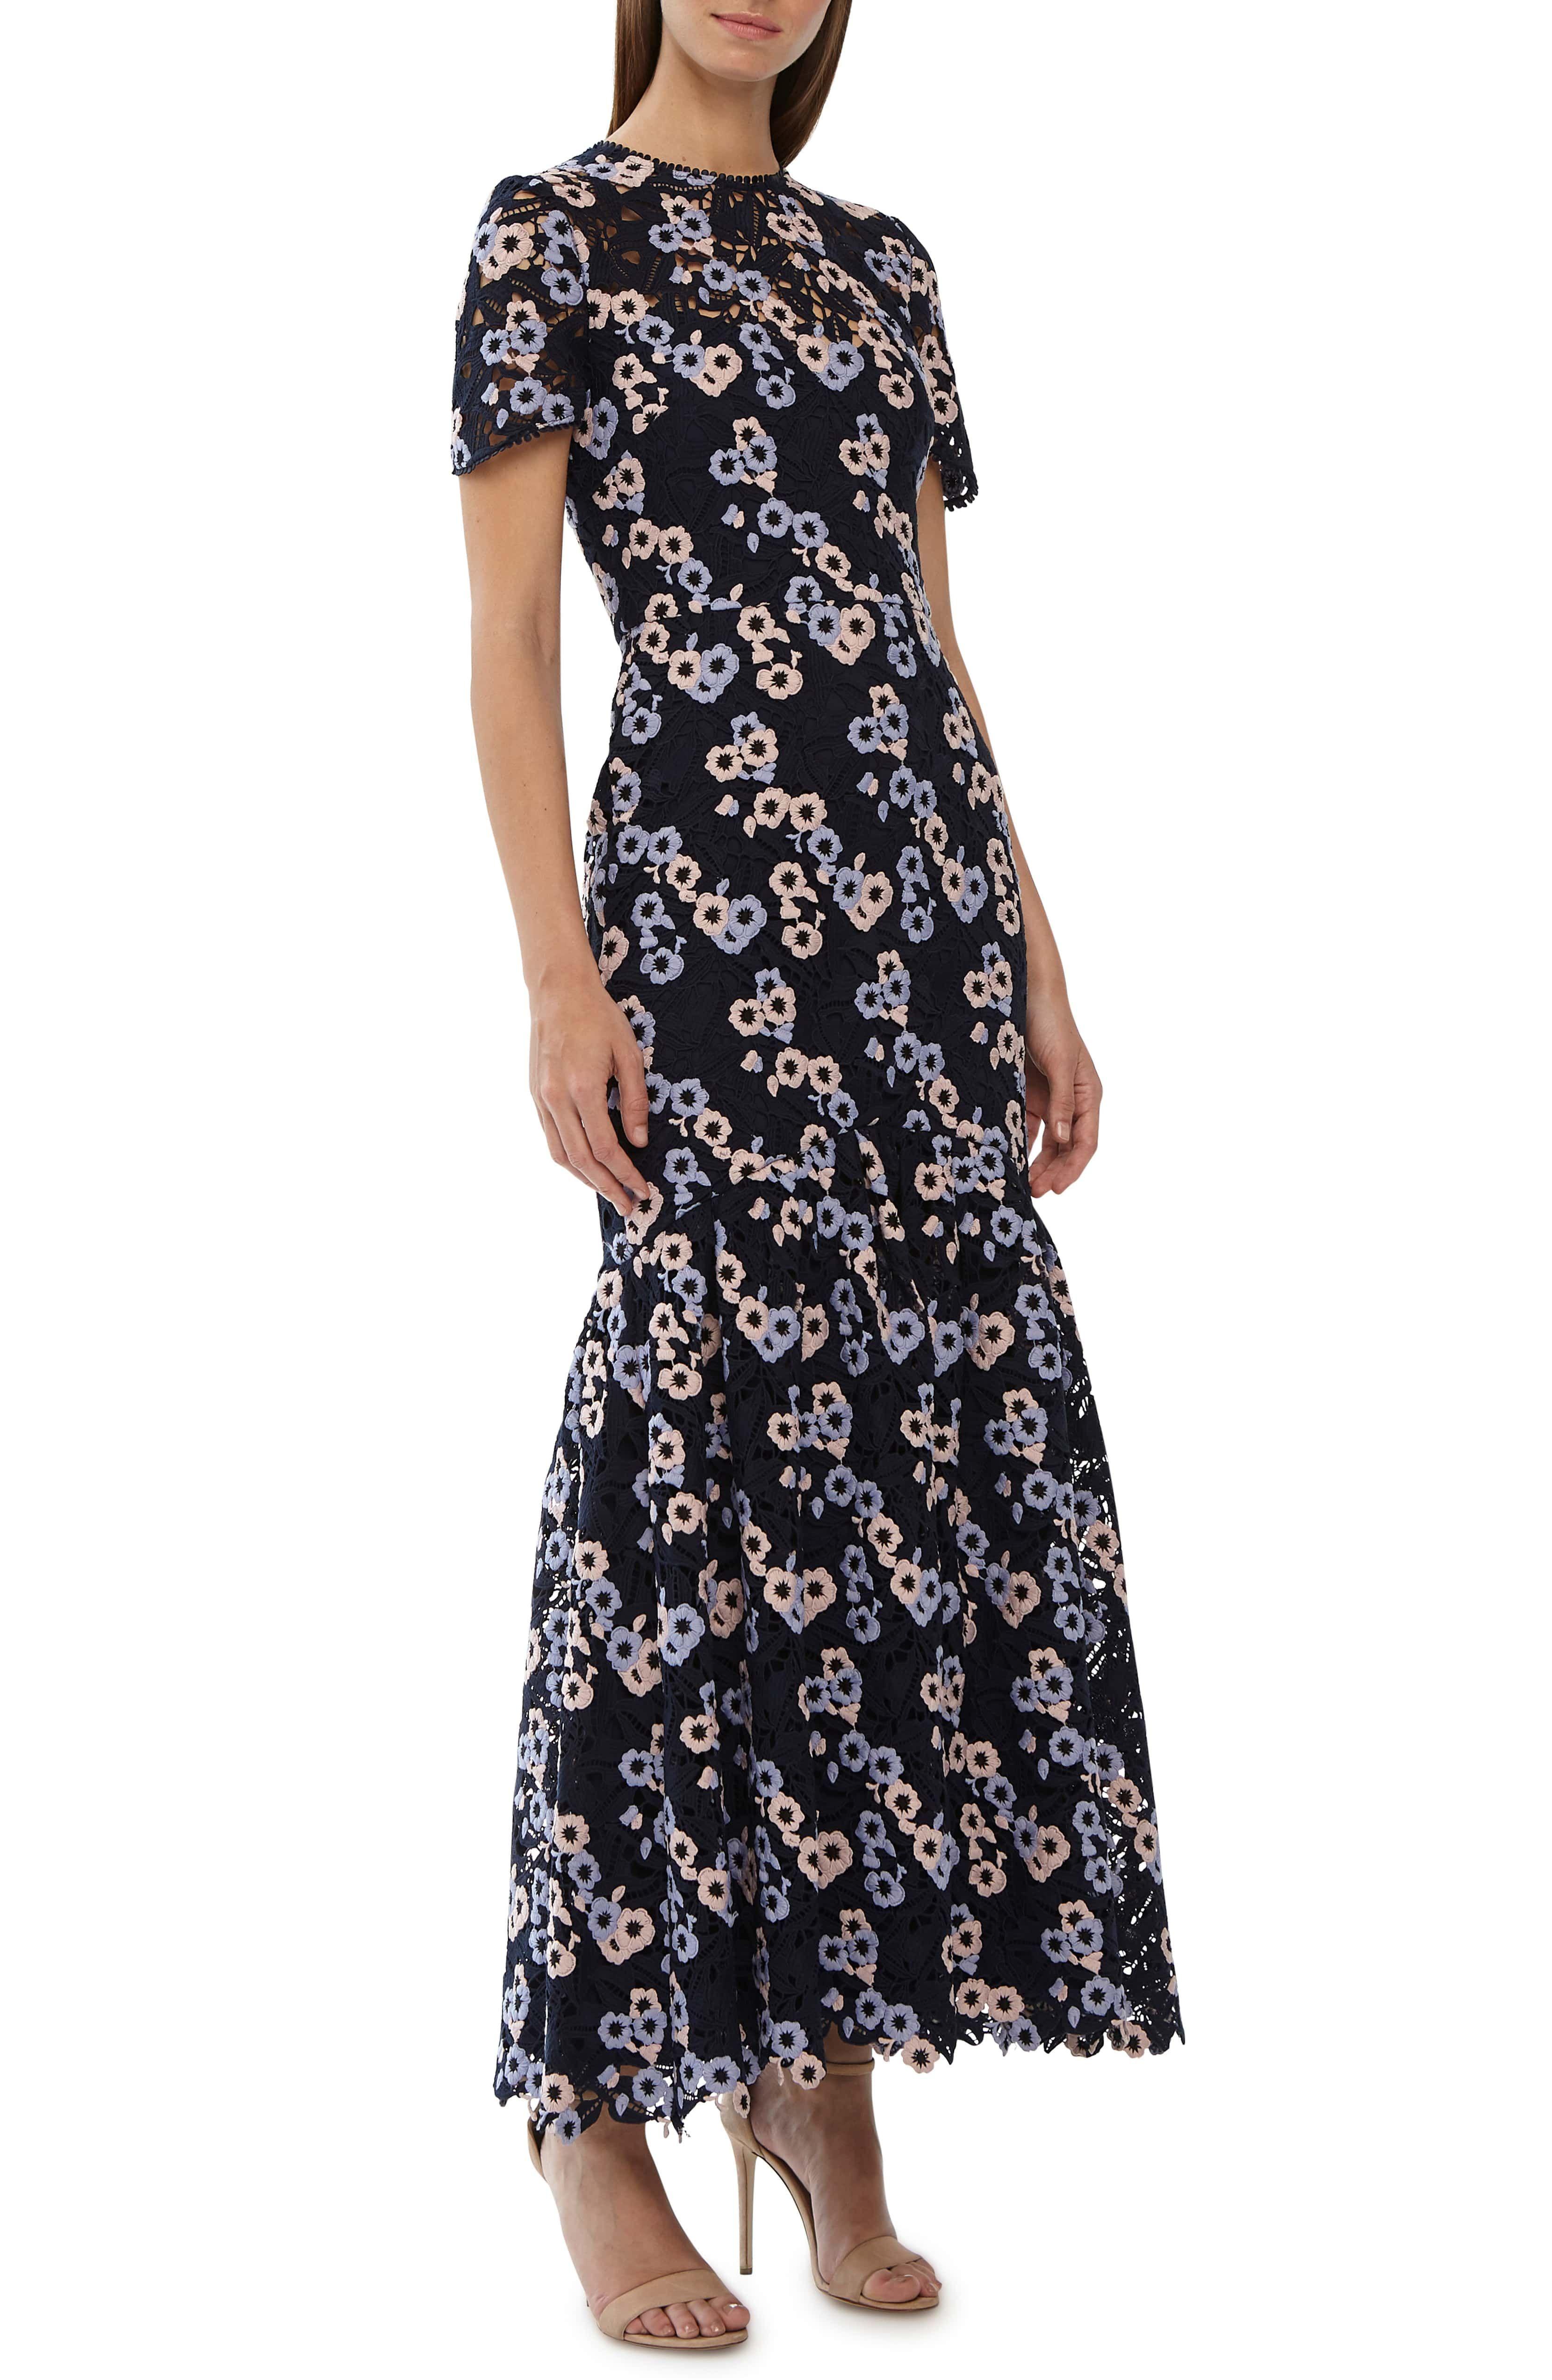 731ab9c8ef8 ML Monique Lhuillier Embroidered Lace Evening Dress